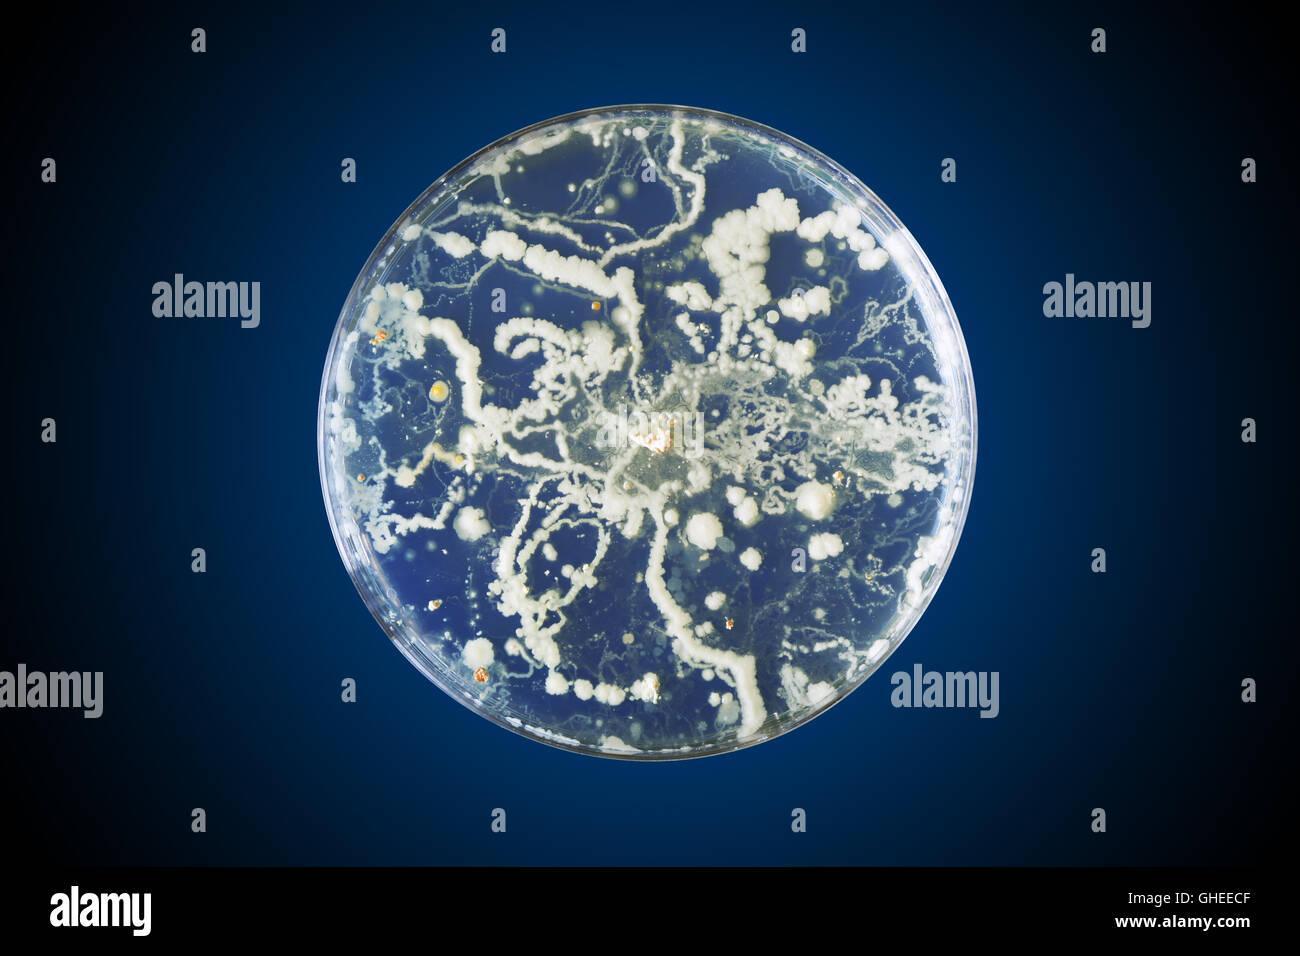 Bacteria growing in a petri dish - Stock Image